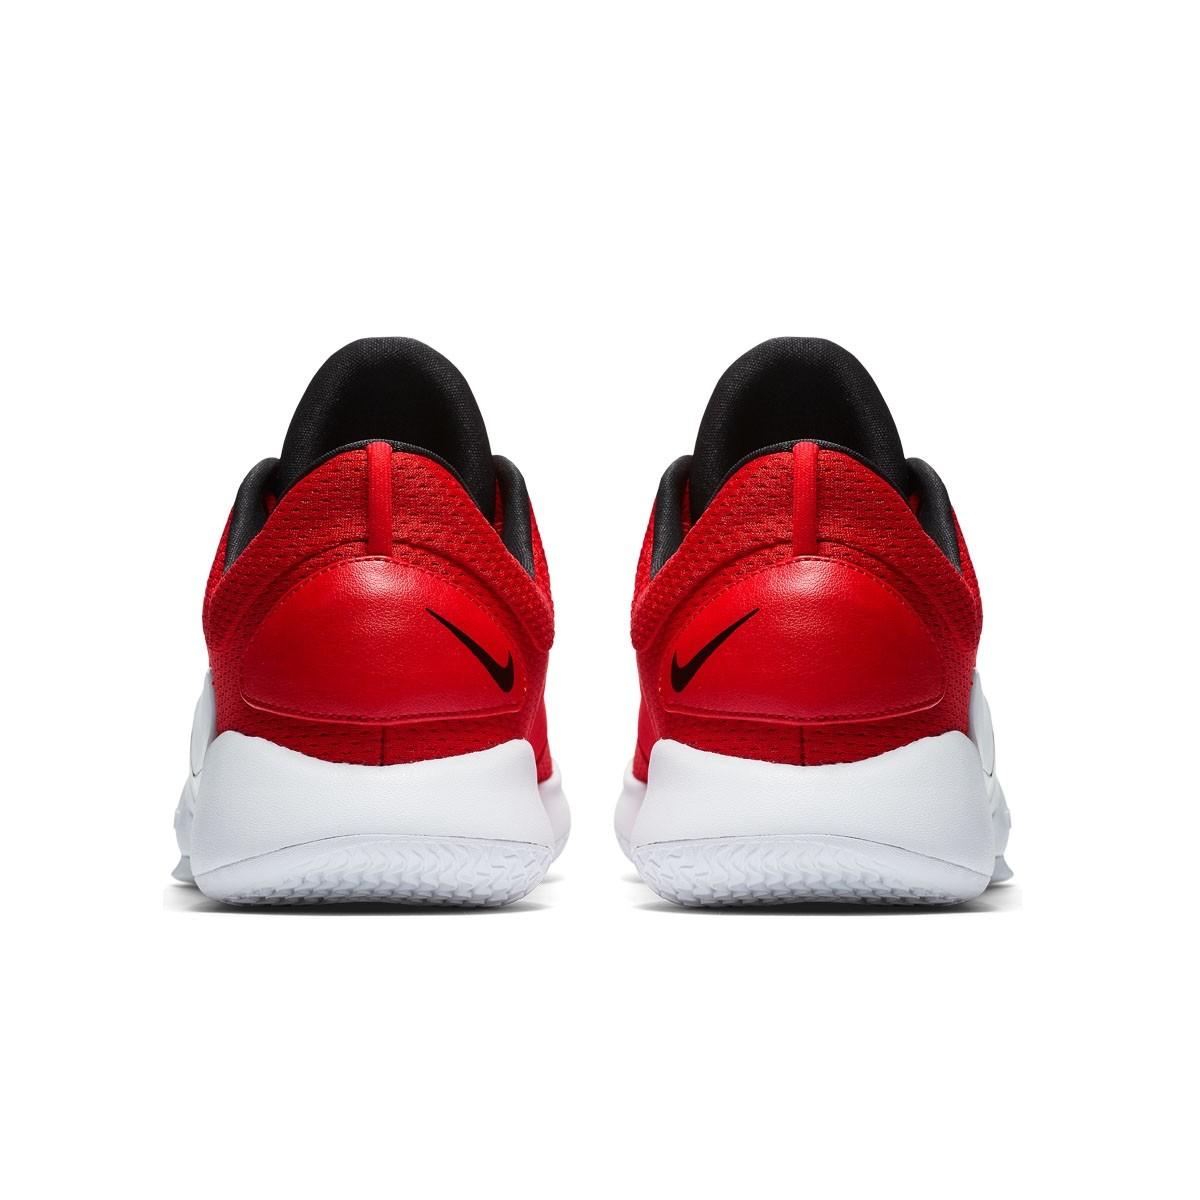 Nike Hyperdunk X Low 2018 'Red' AR0463-600